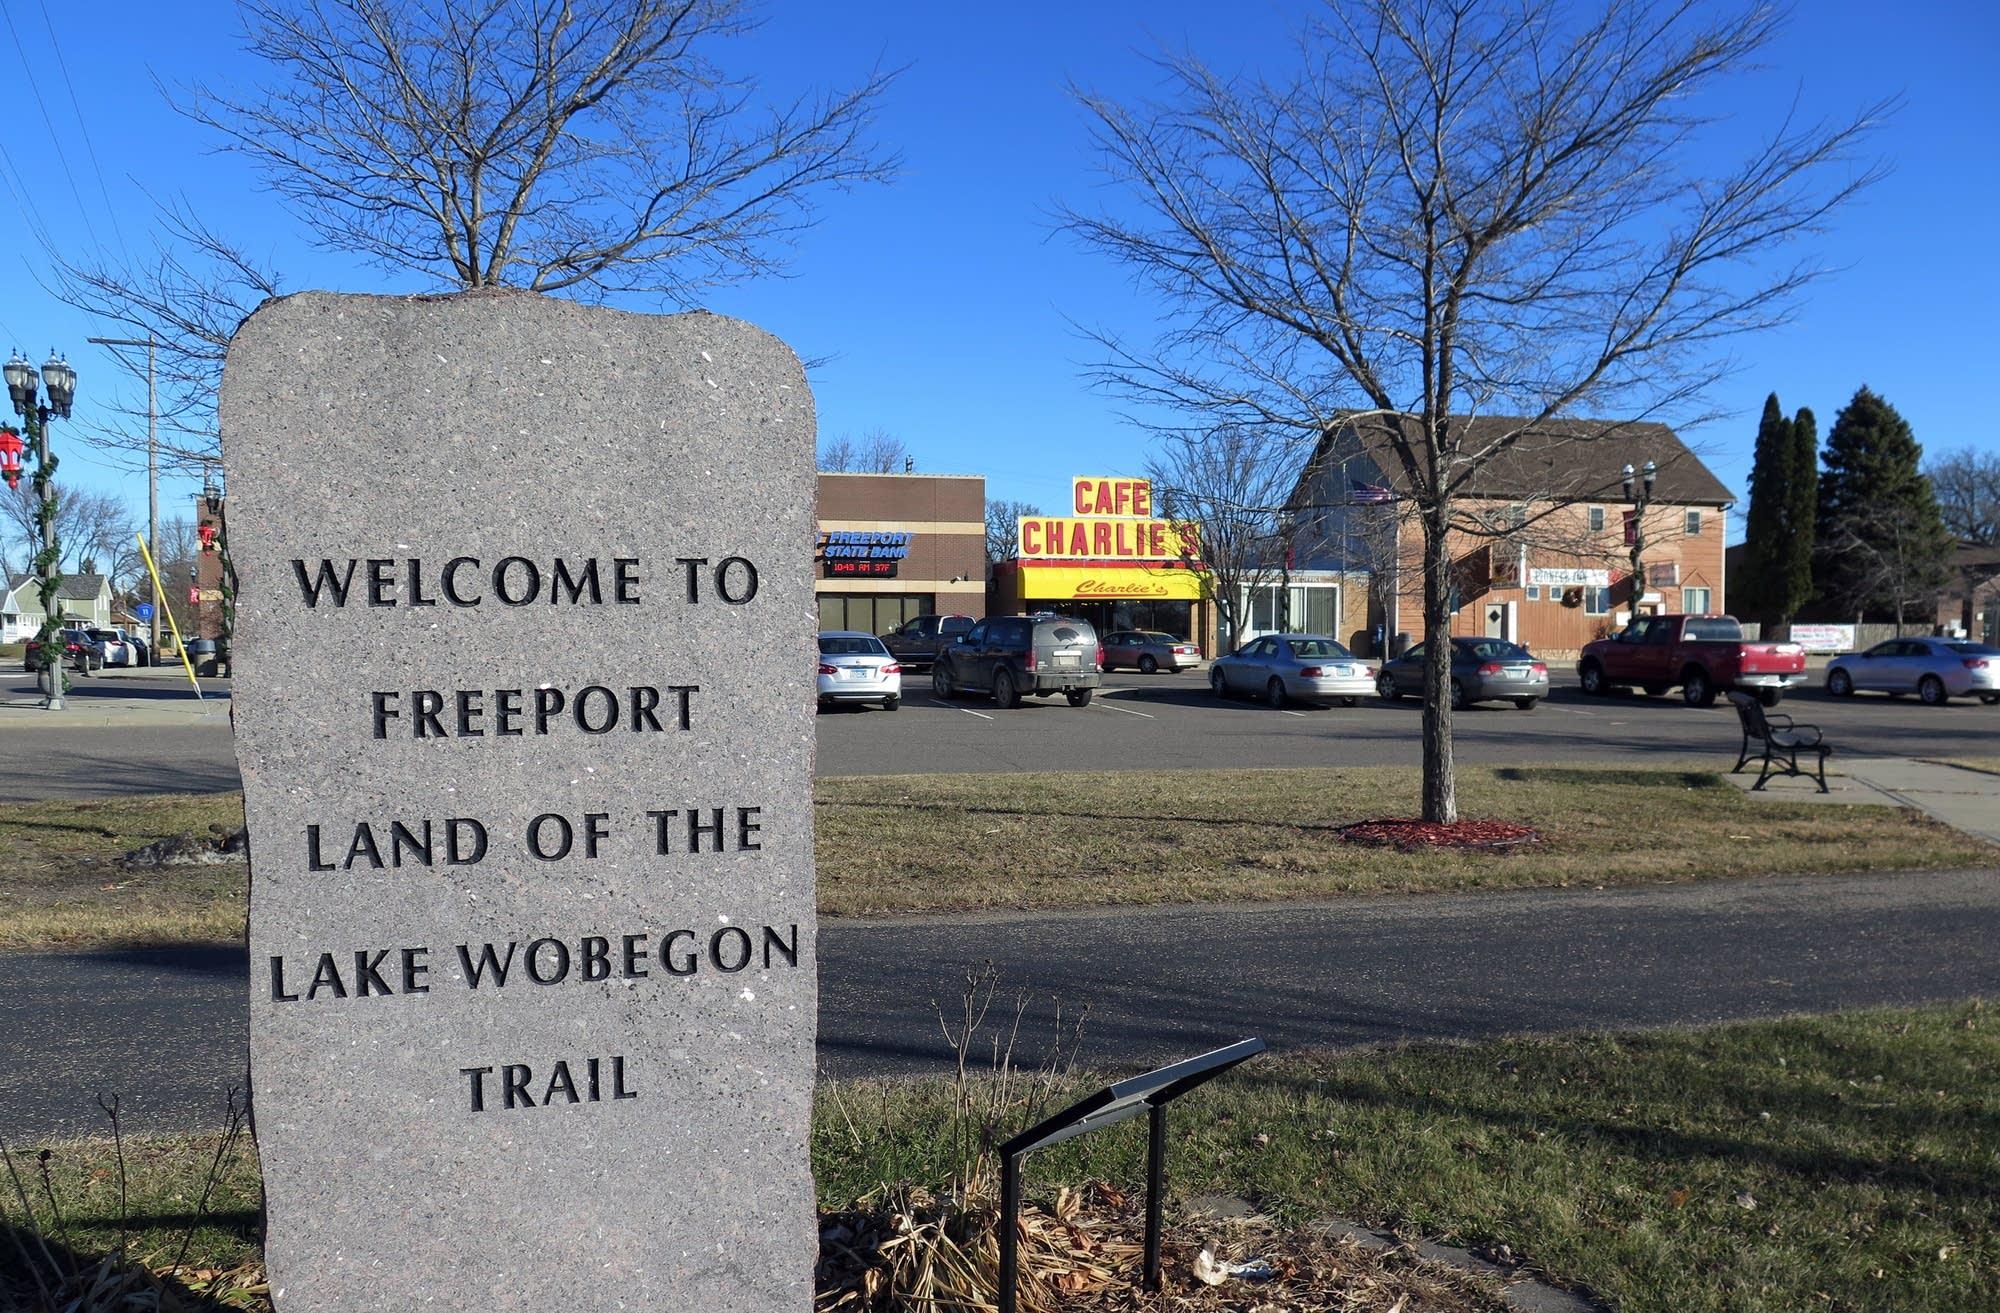 The Lake Wobegon Trail runs through Freeport.